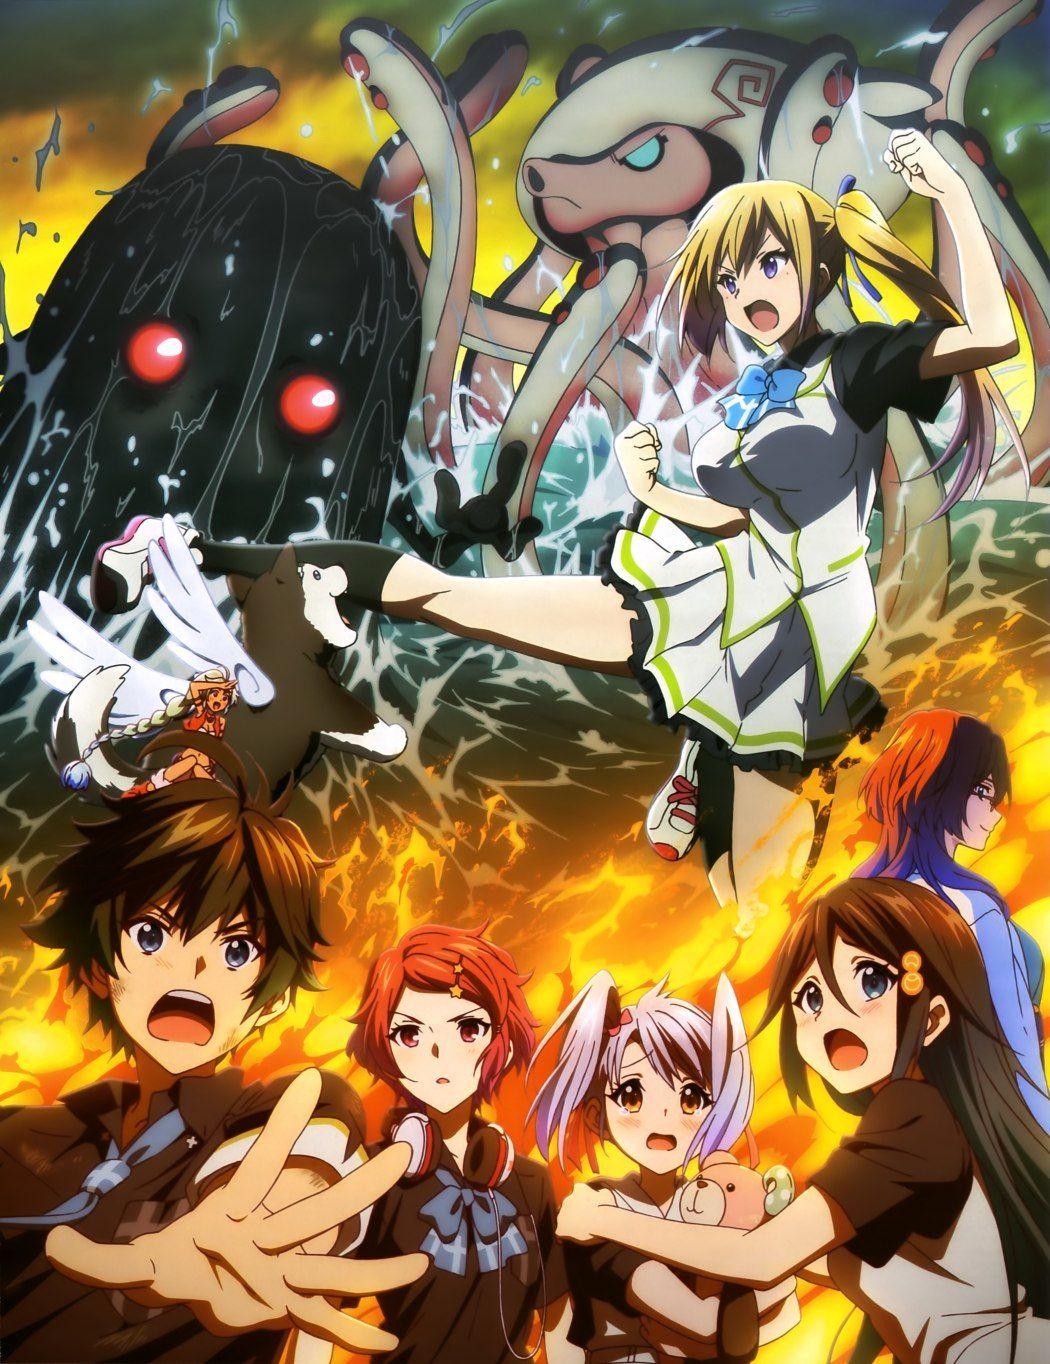 Musaigen No Phantom World : musaigen, phantom, world, Latest, Musaigen, Phantom, World, Visual, Looks, Movie, Poster, Haruhichan, Anime,, Anime, Movies